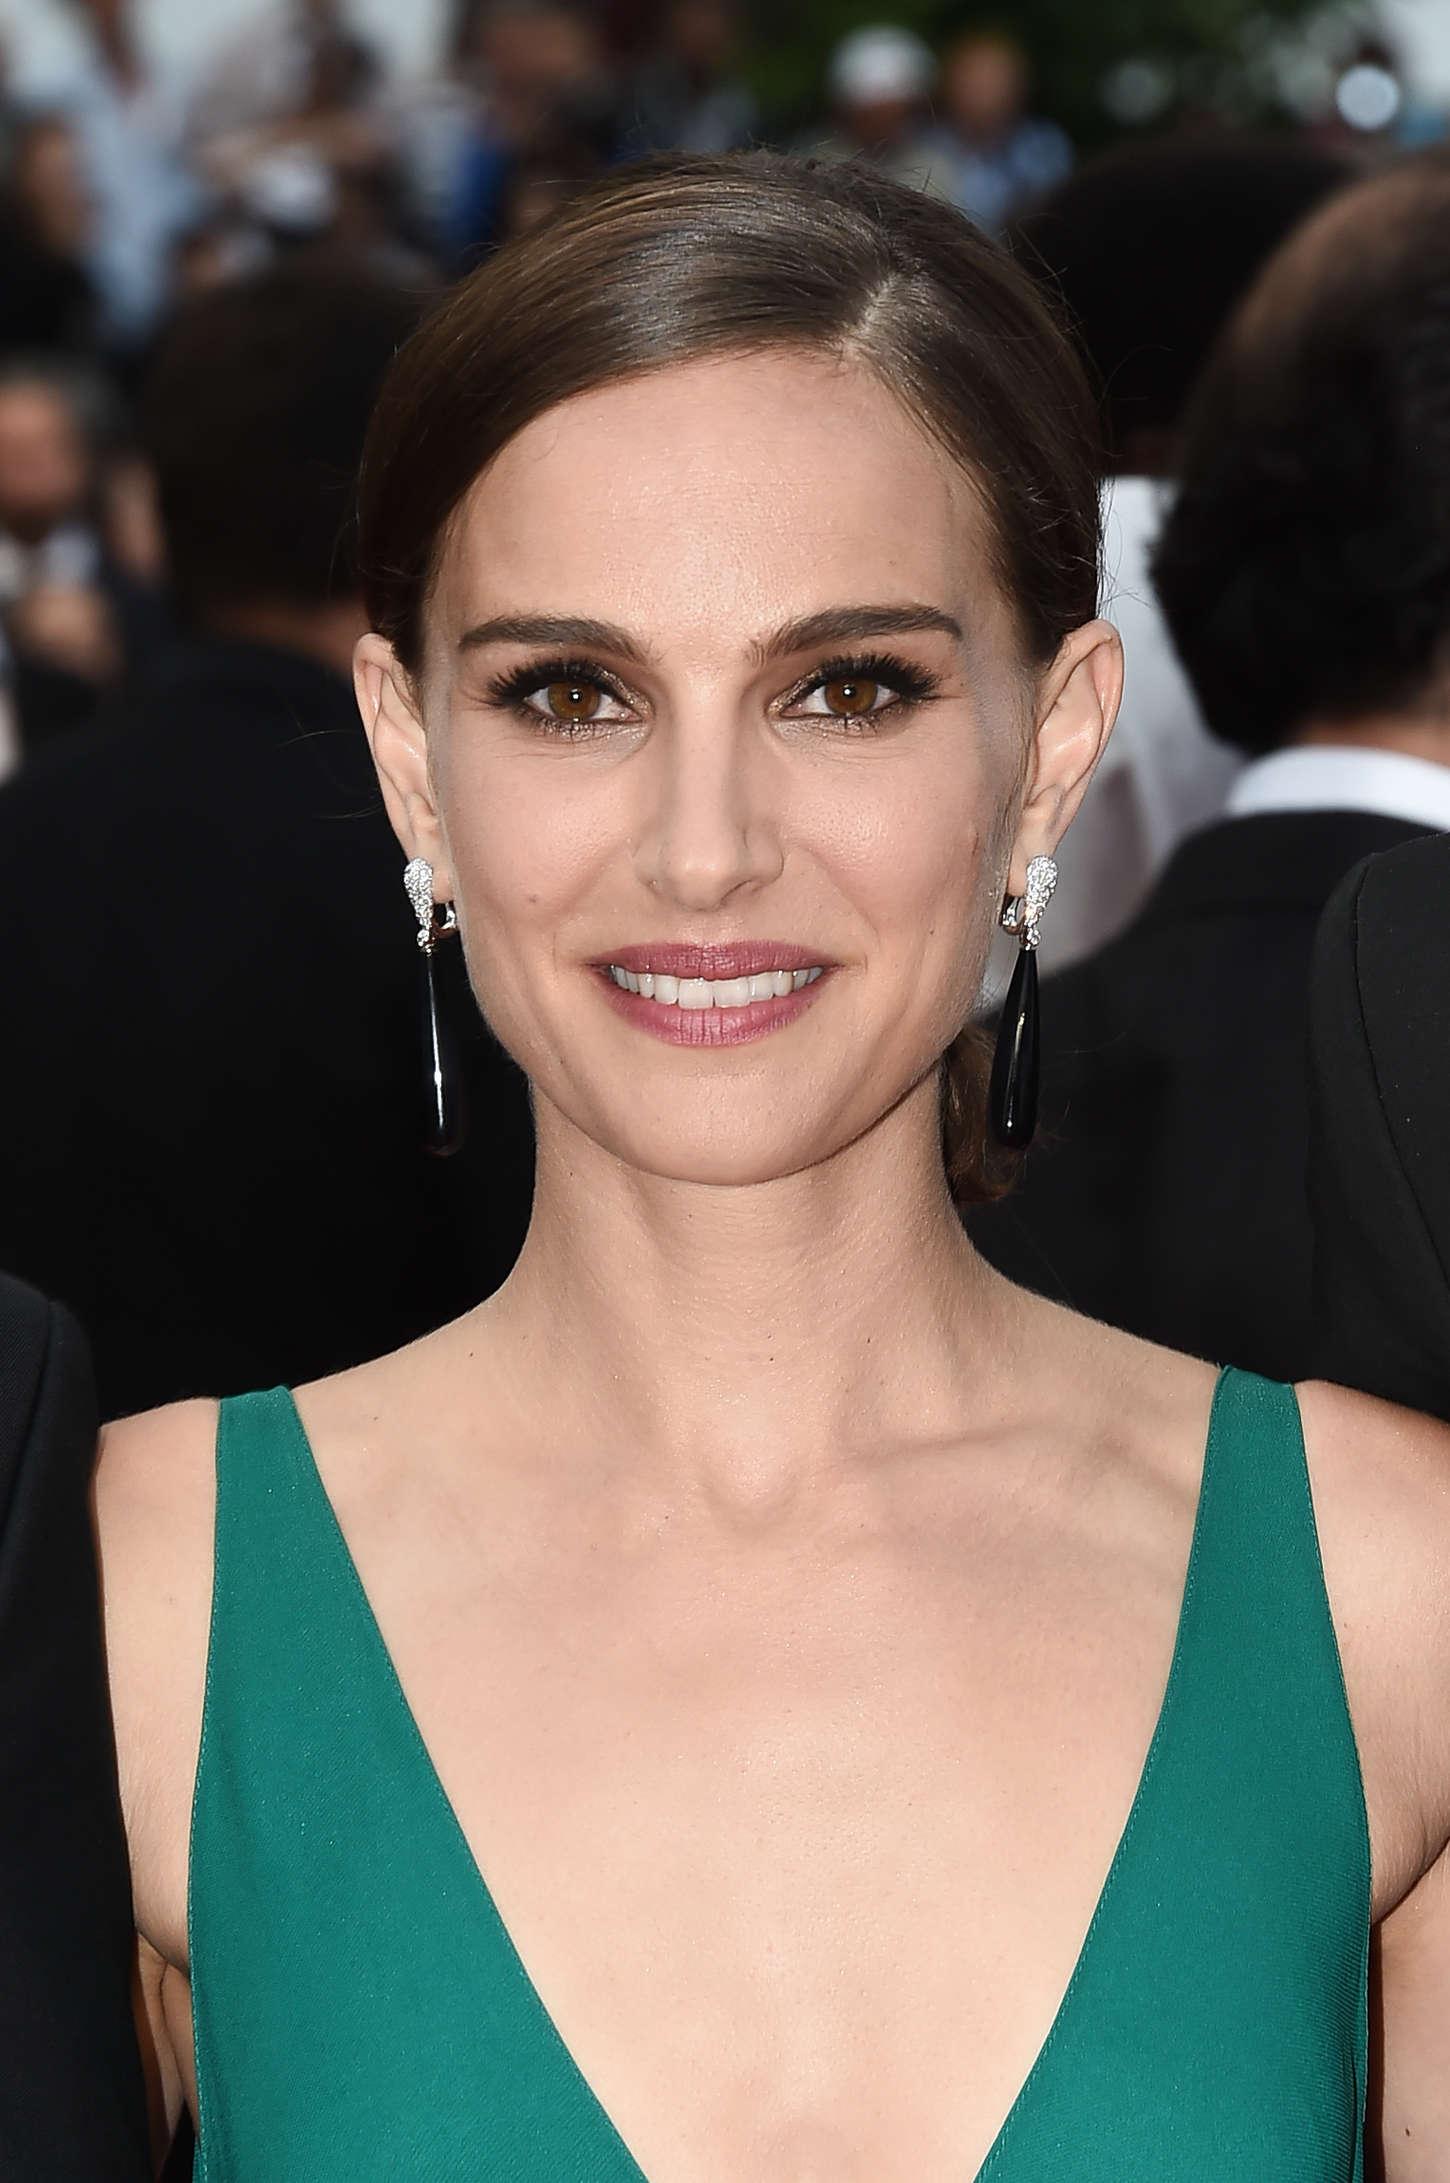 Natalie Portman 2015 : Natalie Portman: Sicario Premiere -10